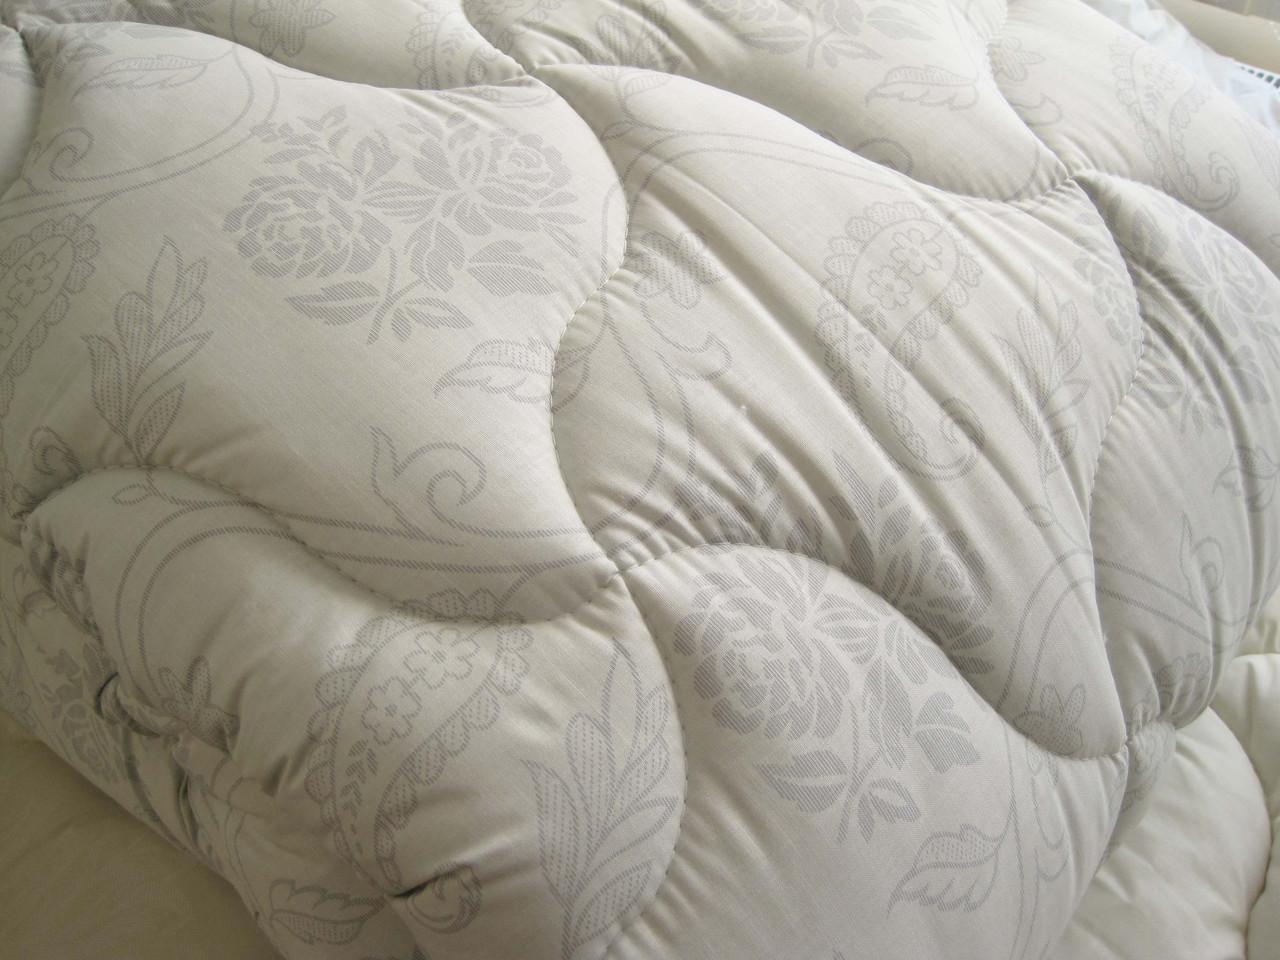 Одеяло двуспальное евро холлофайбер хлопок 200*210 (4416) TM KRISPOL Украина